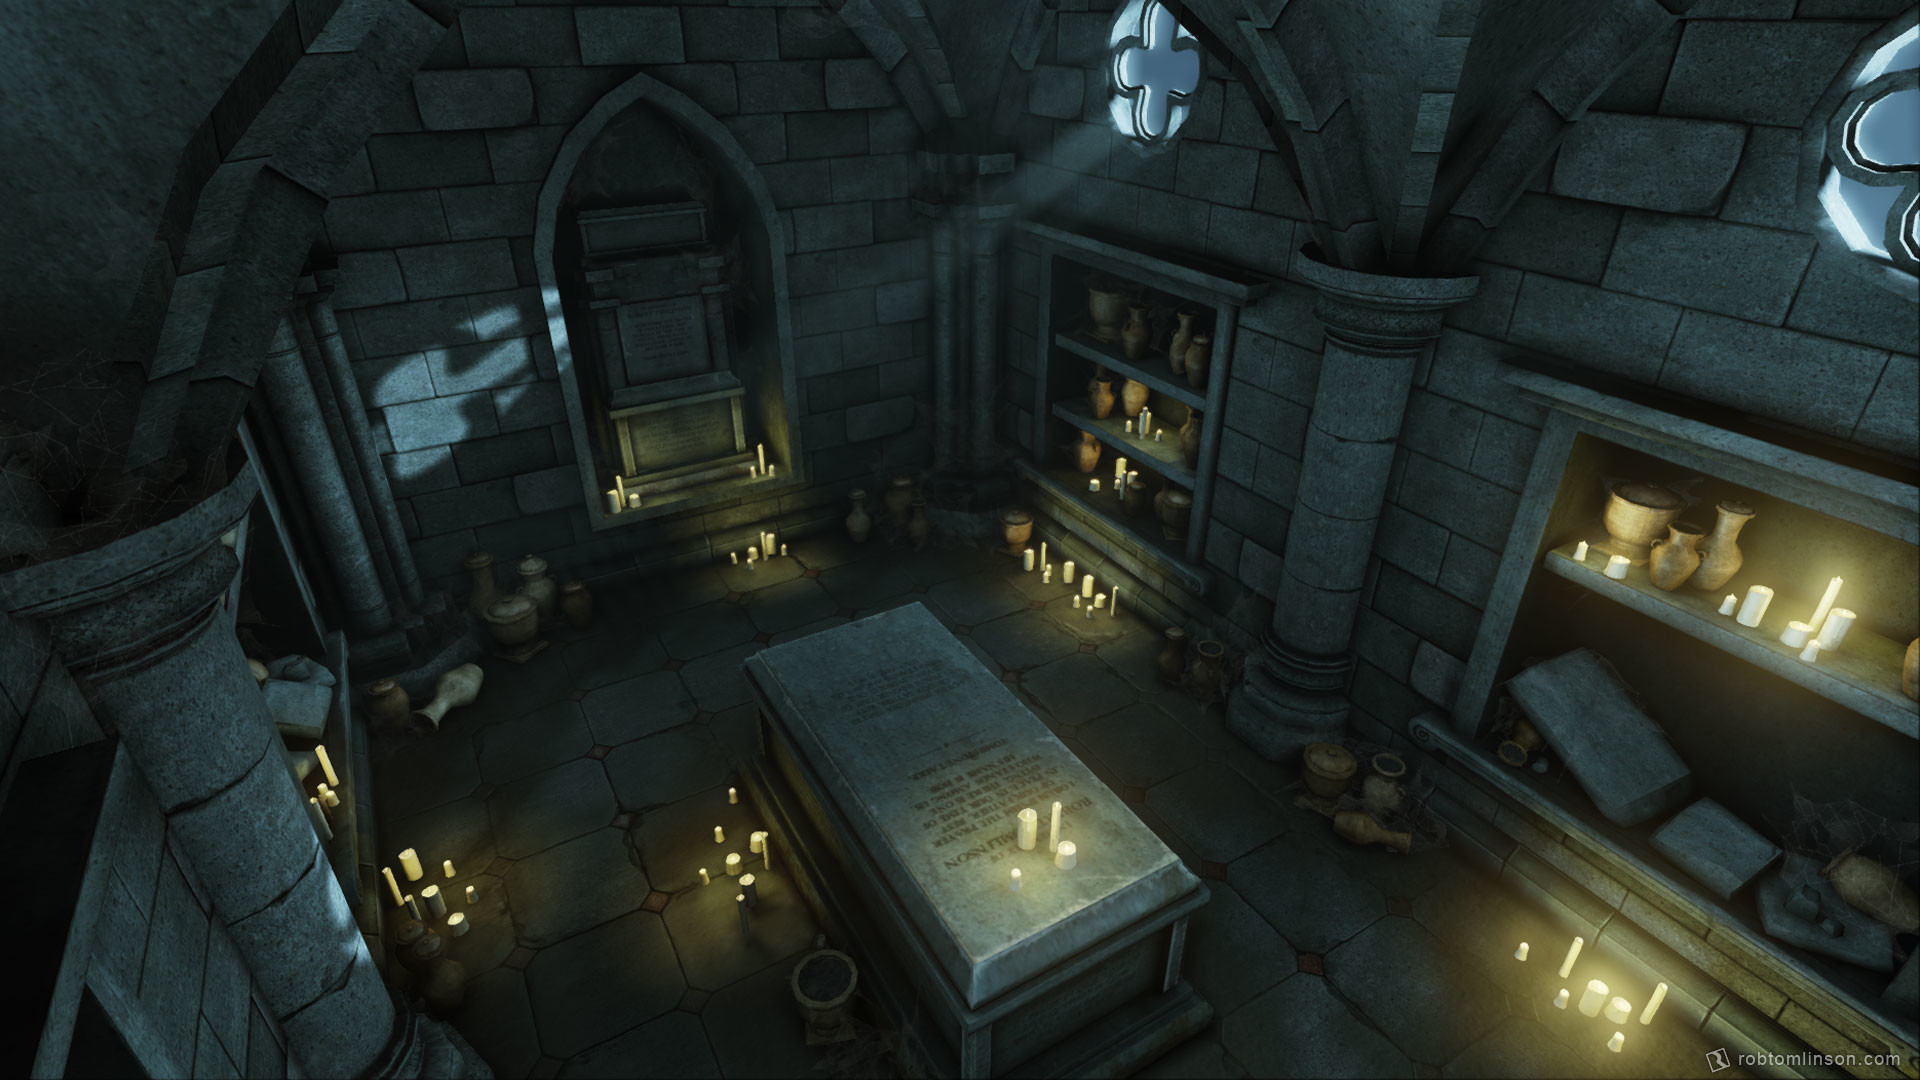 Rob tomlinson mausoleum 2